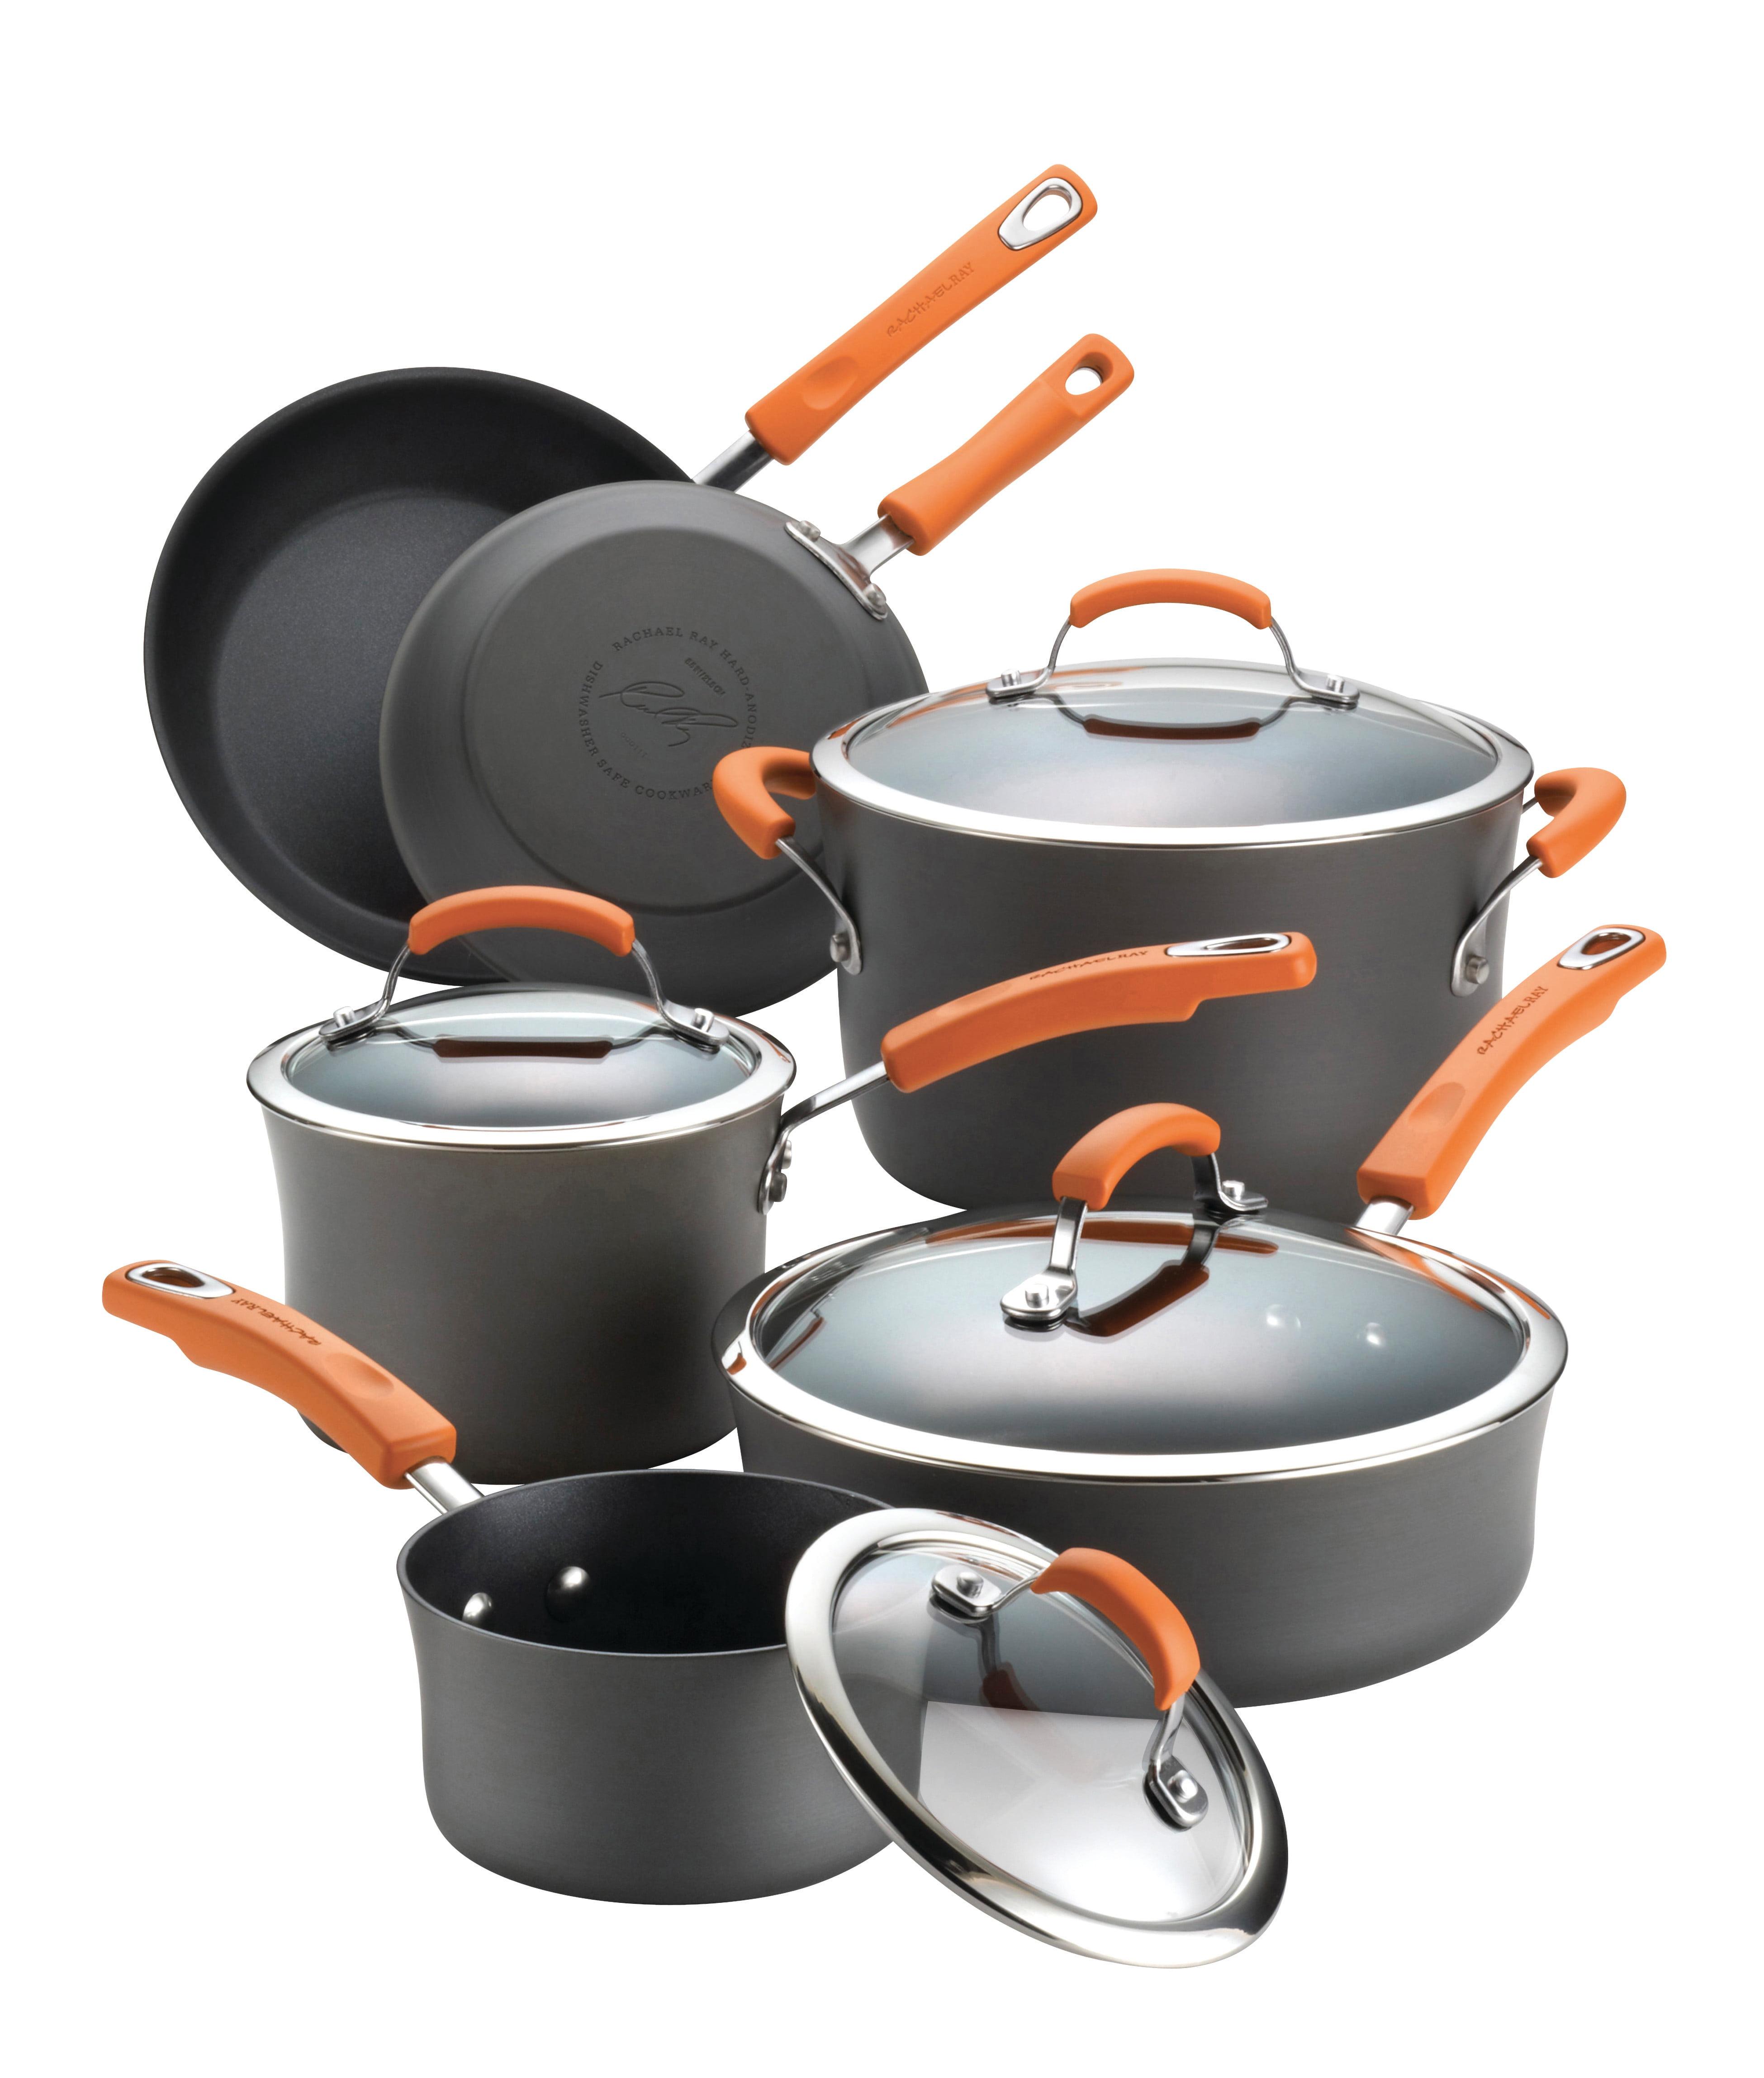 Cuisinart 64-13 13 Pc Contour Hard Anodized Perp Cookware Set ...